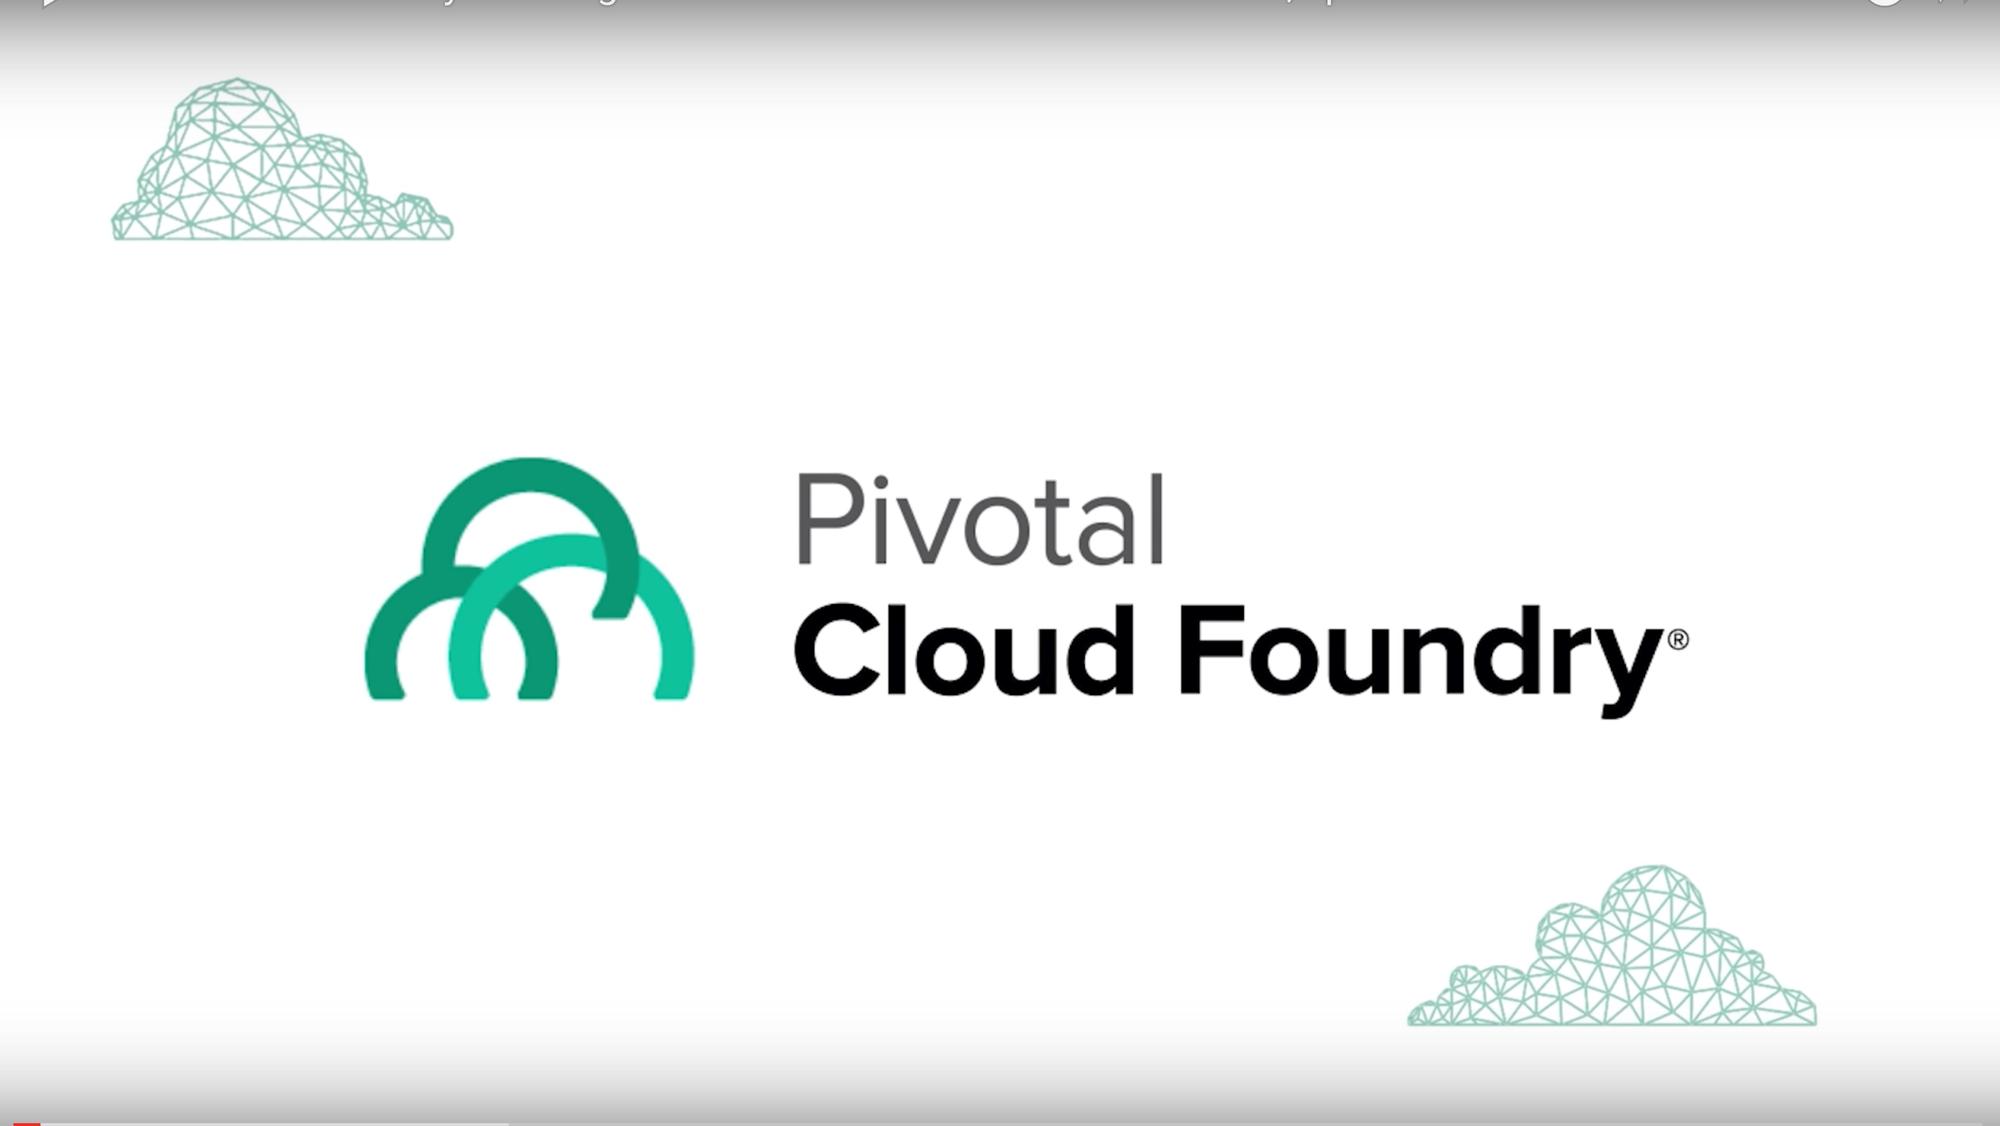 Pivotal Cloud Foundry